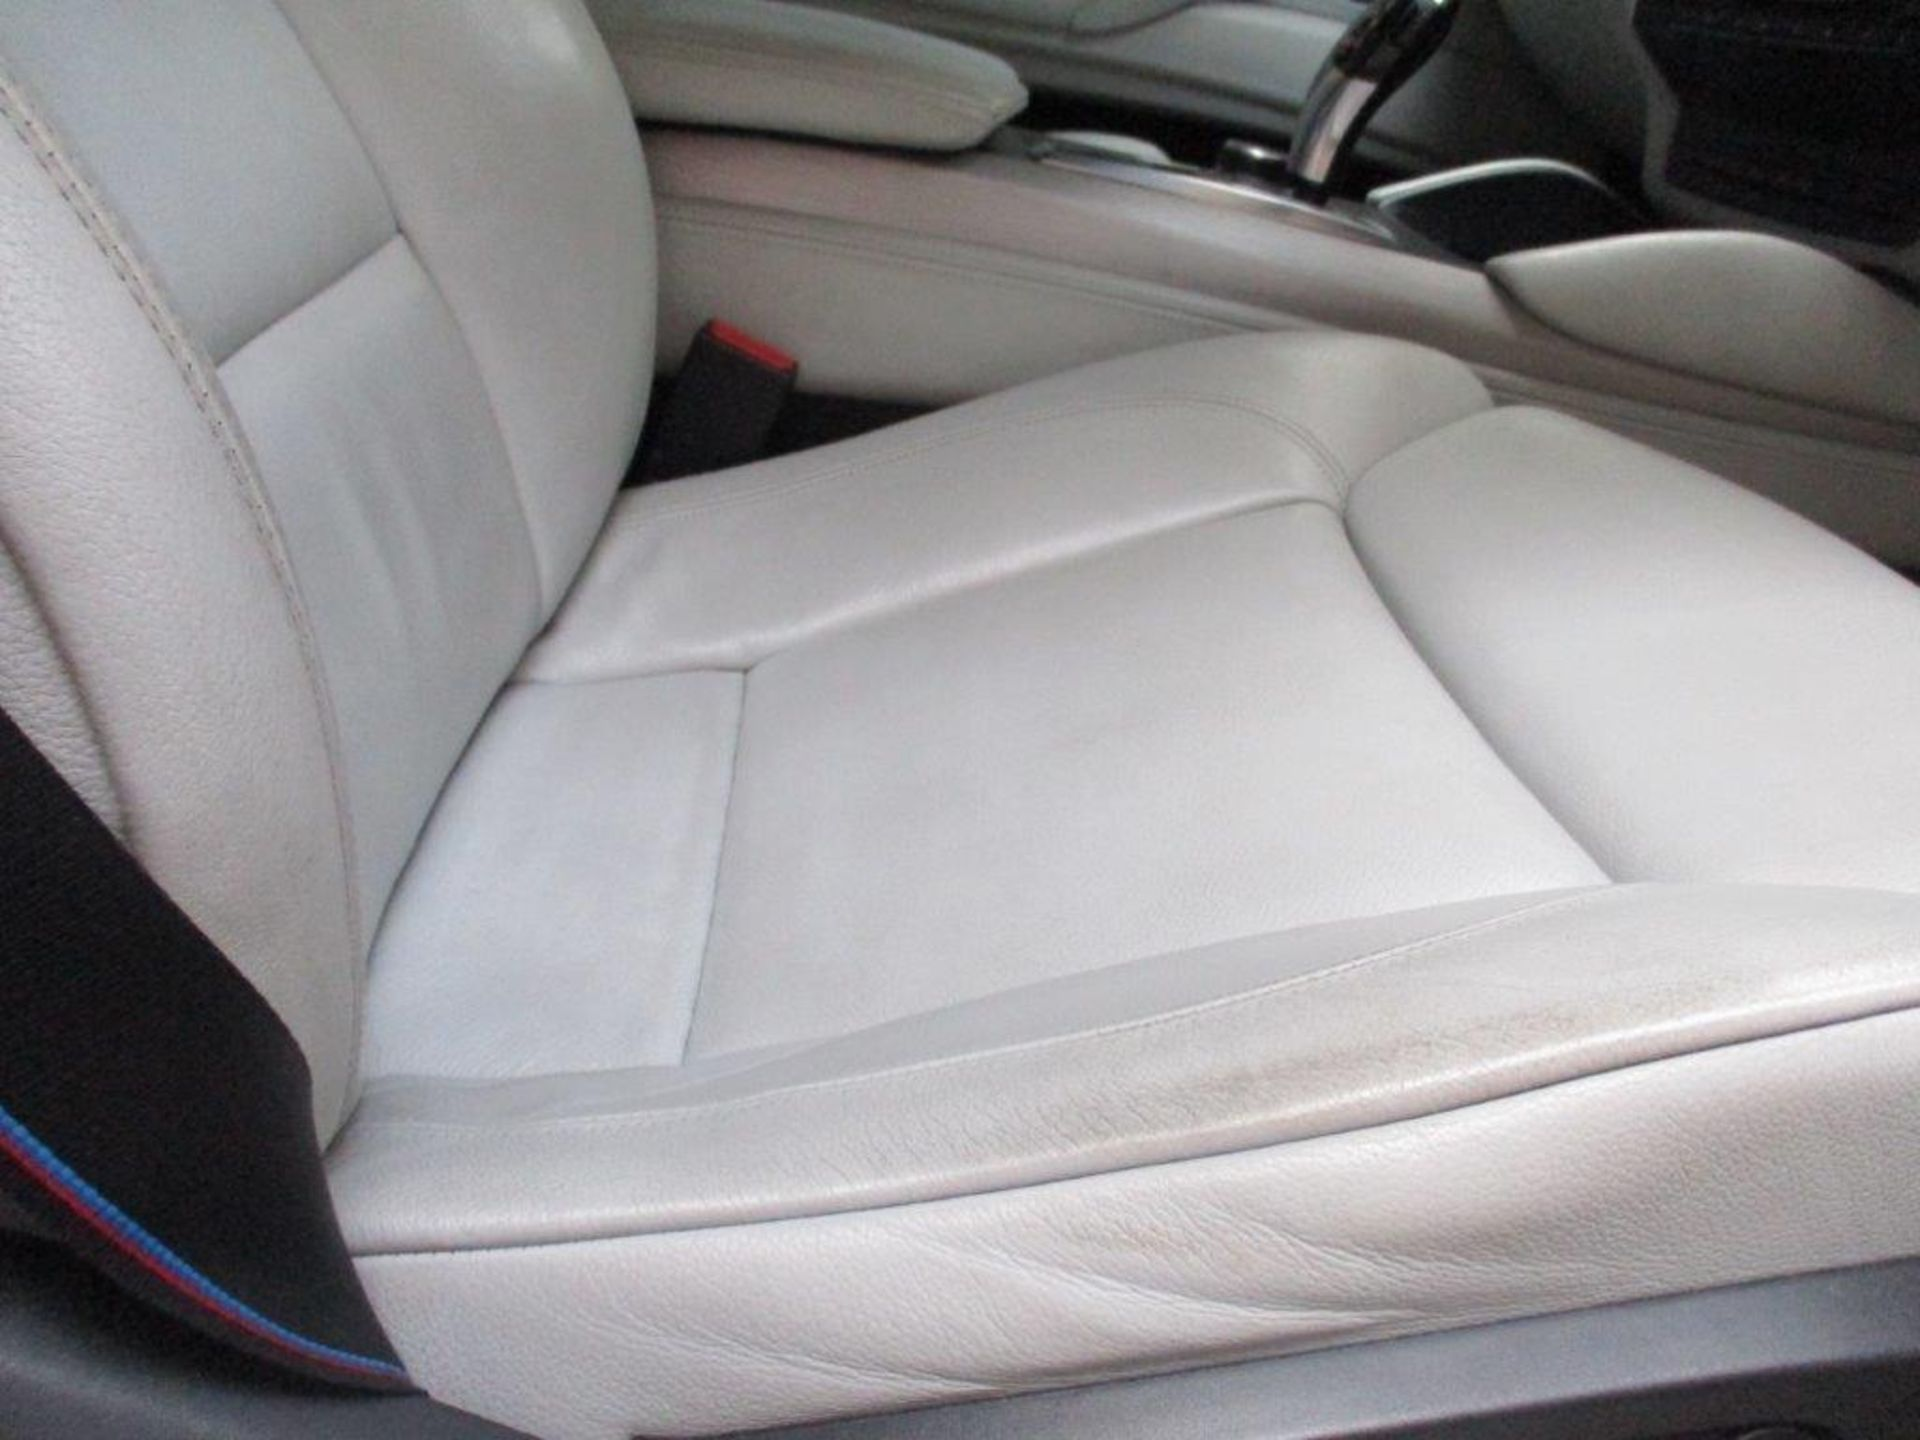 60 10 BMW X5 M Turbo Auto - Image 25 of 35